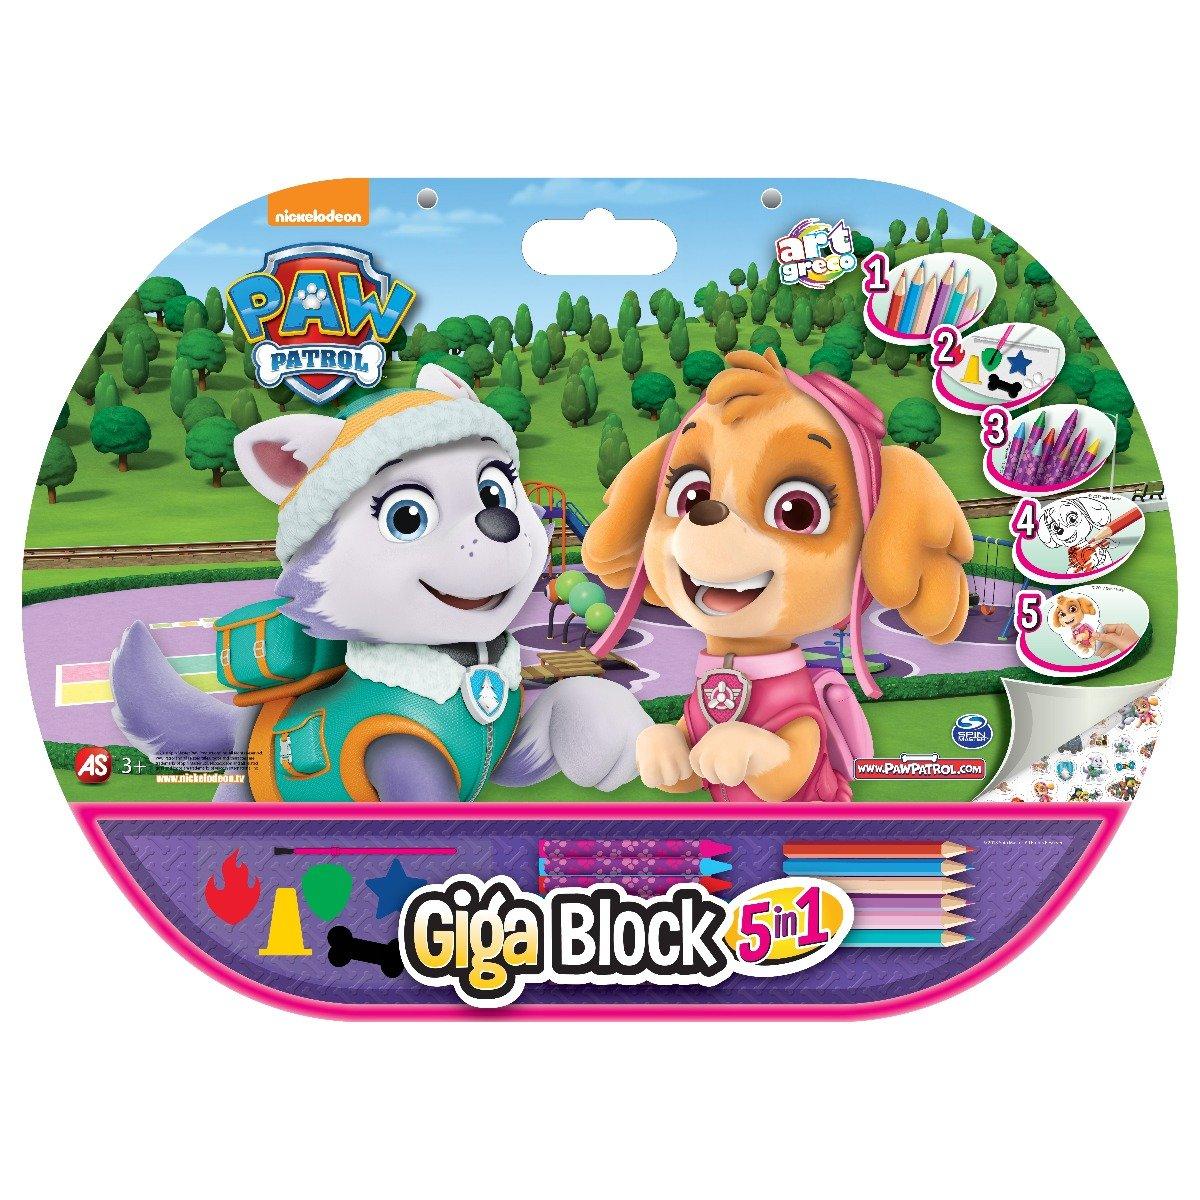 Set Desen Si Accesorii Paw Patrol Skye Giga Block 5 In 1